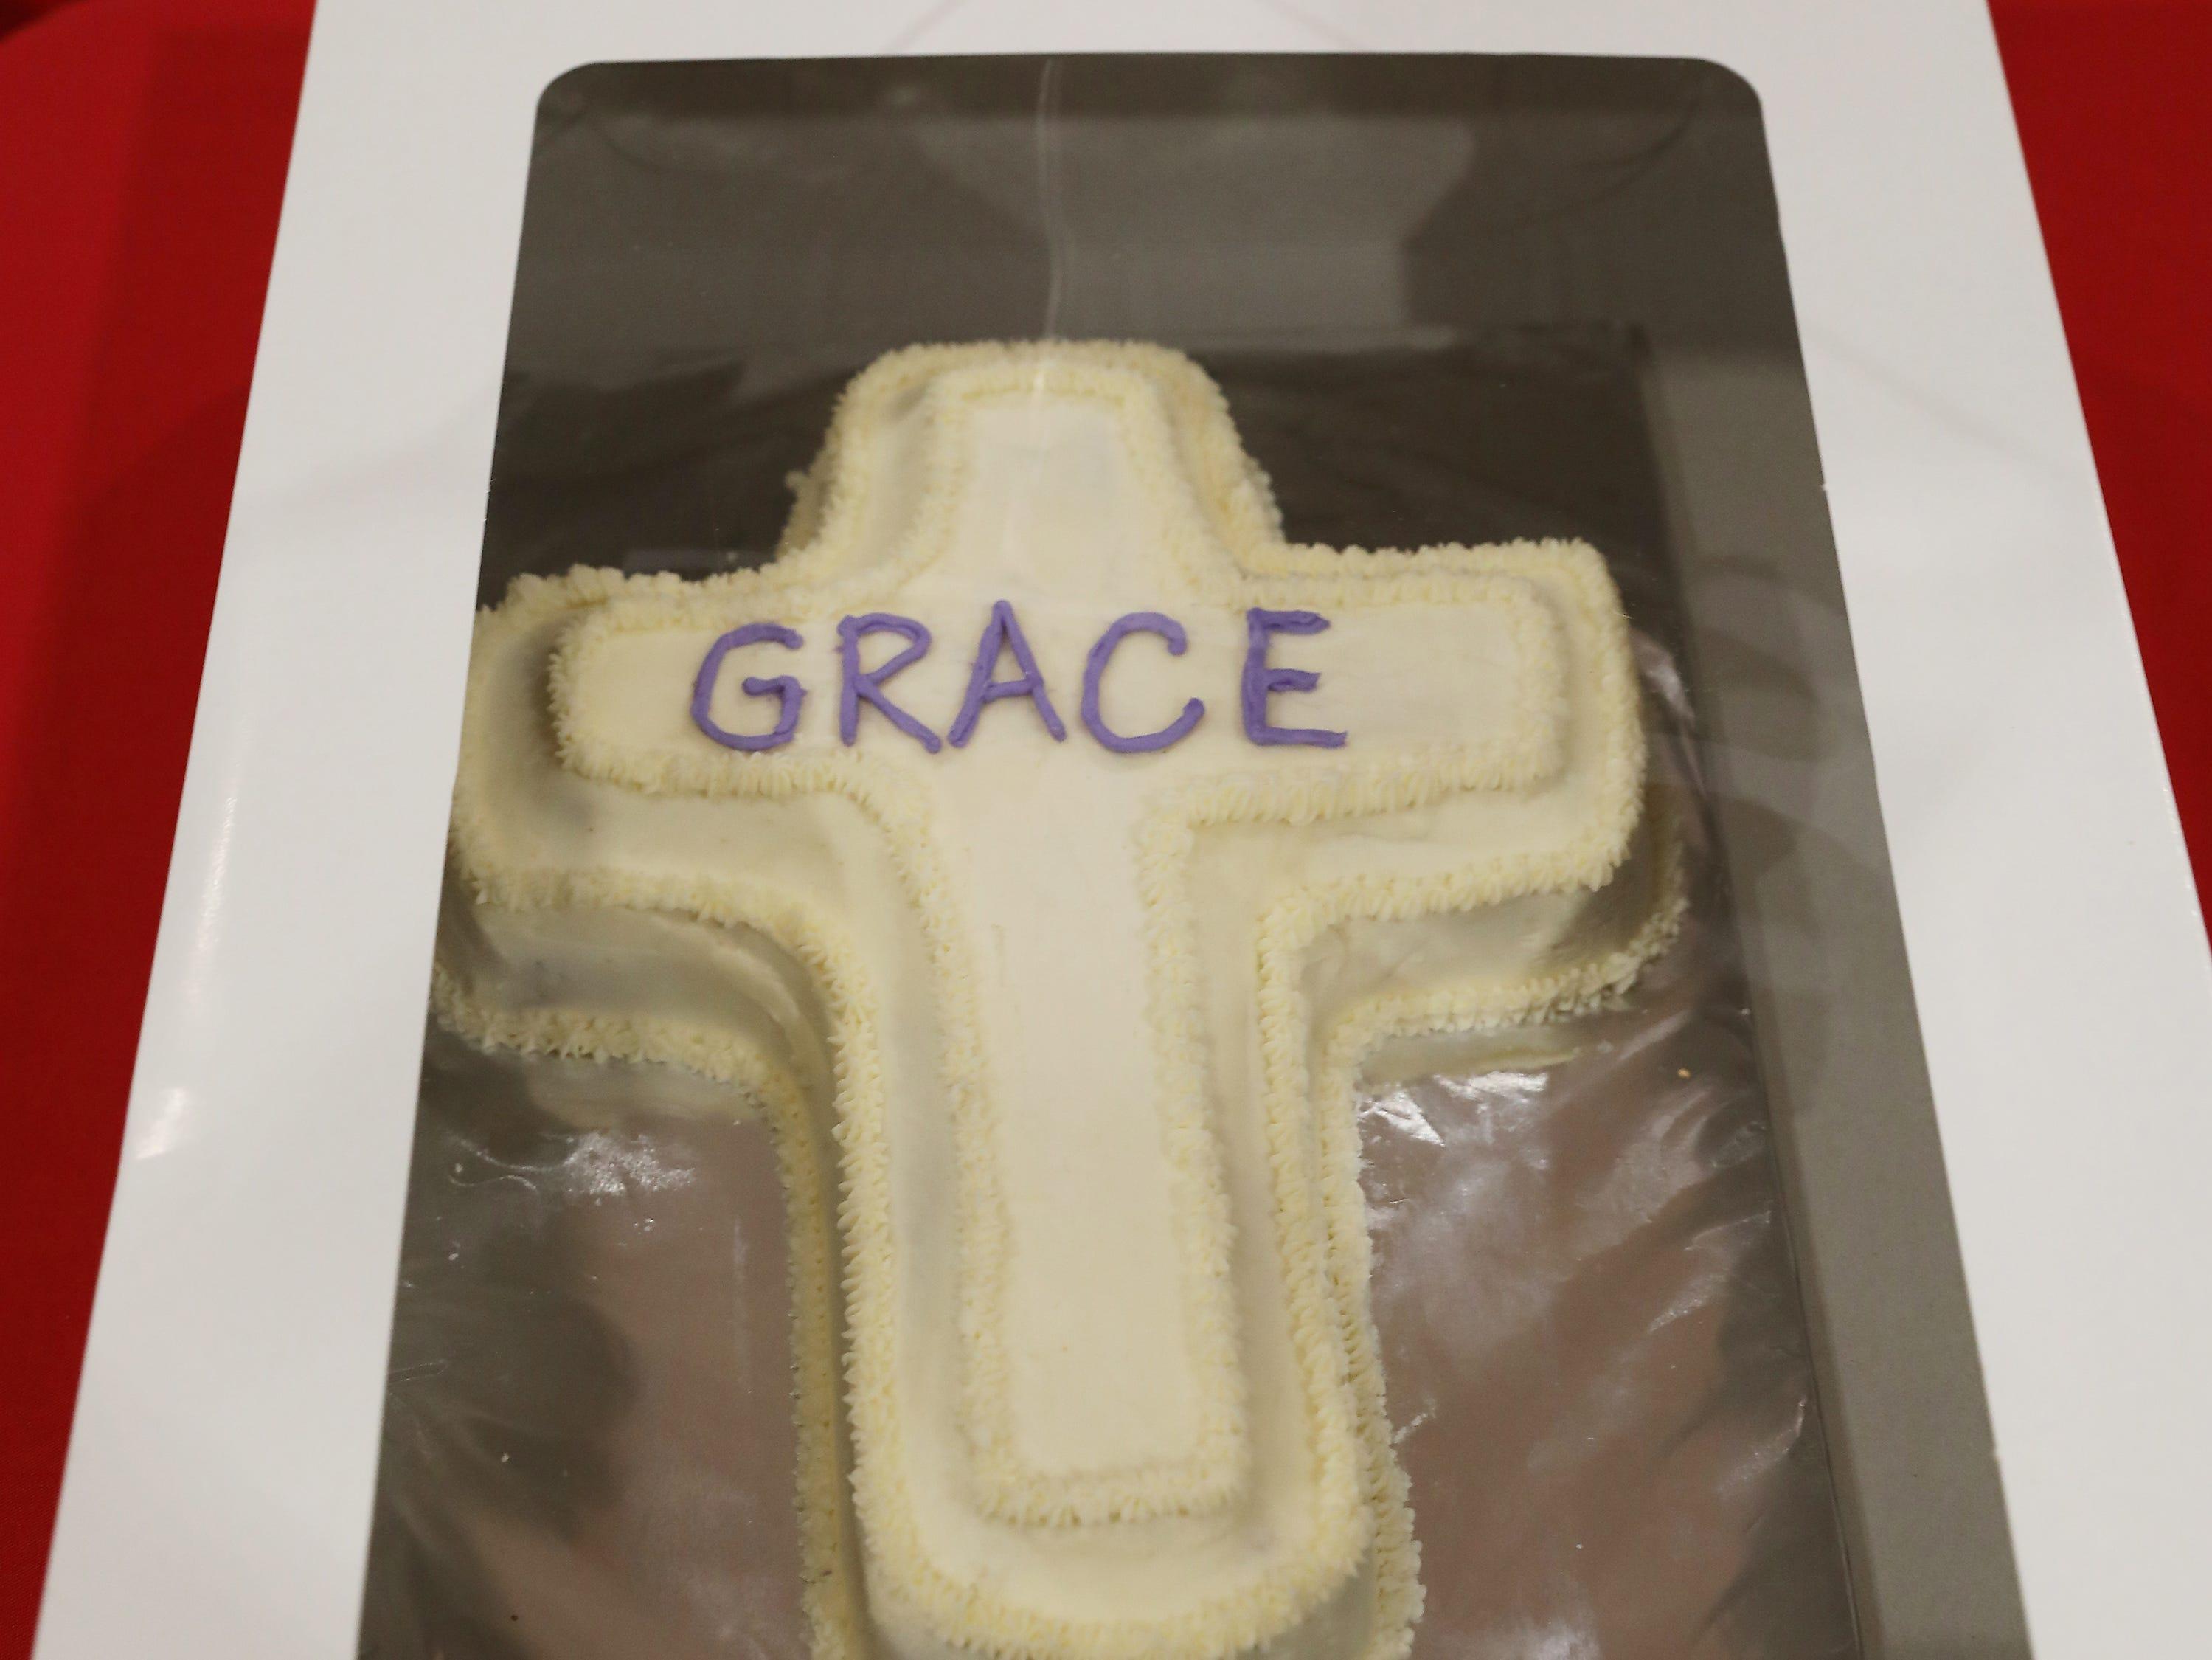 12:45 P.M. Thursday cake 88 Grace United Methodist Church - nativity set, $50 gift cards to Winerak and $50 Giacomos; $175.